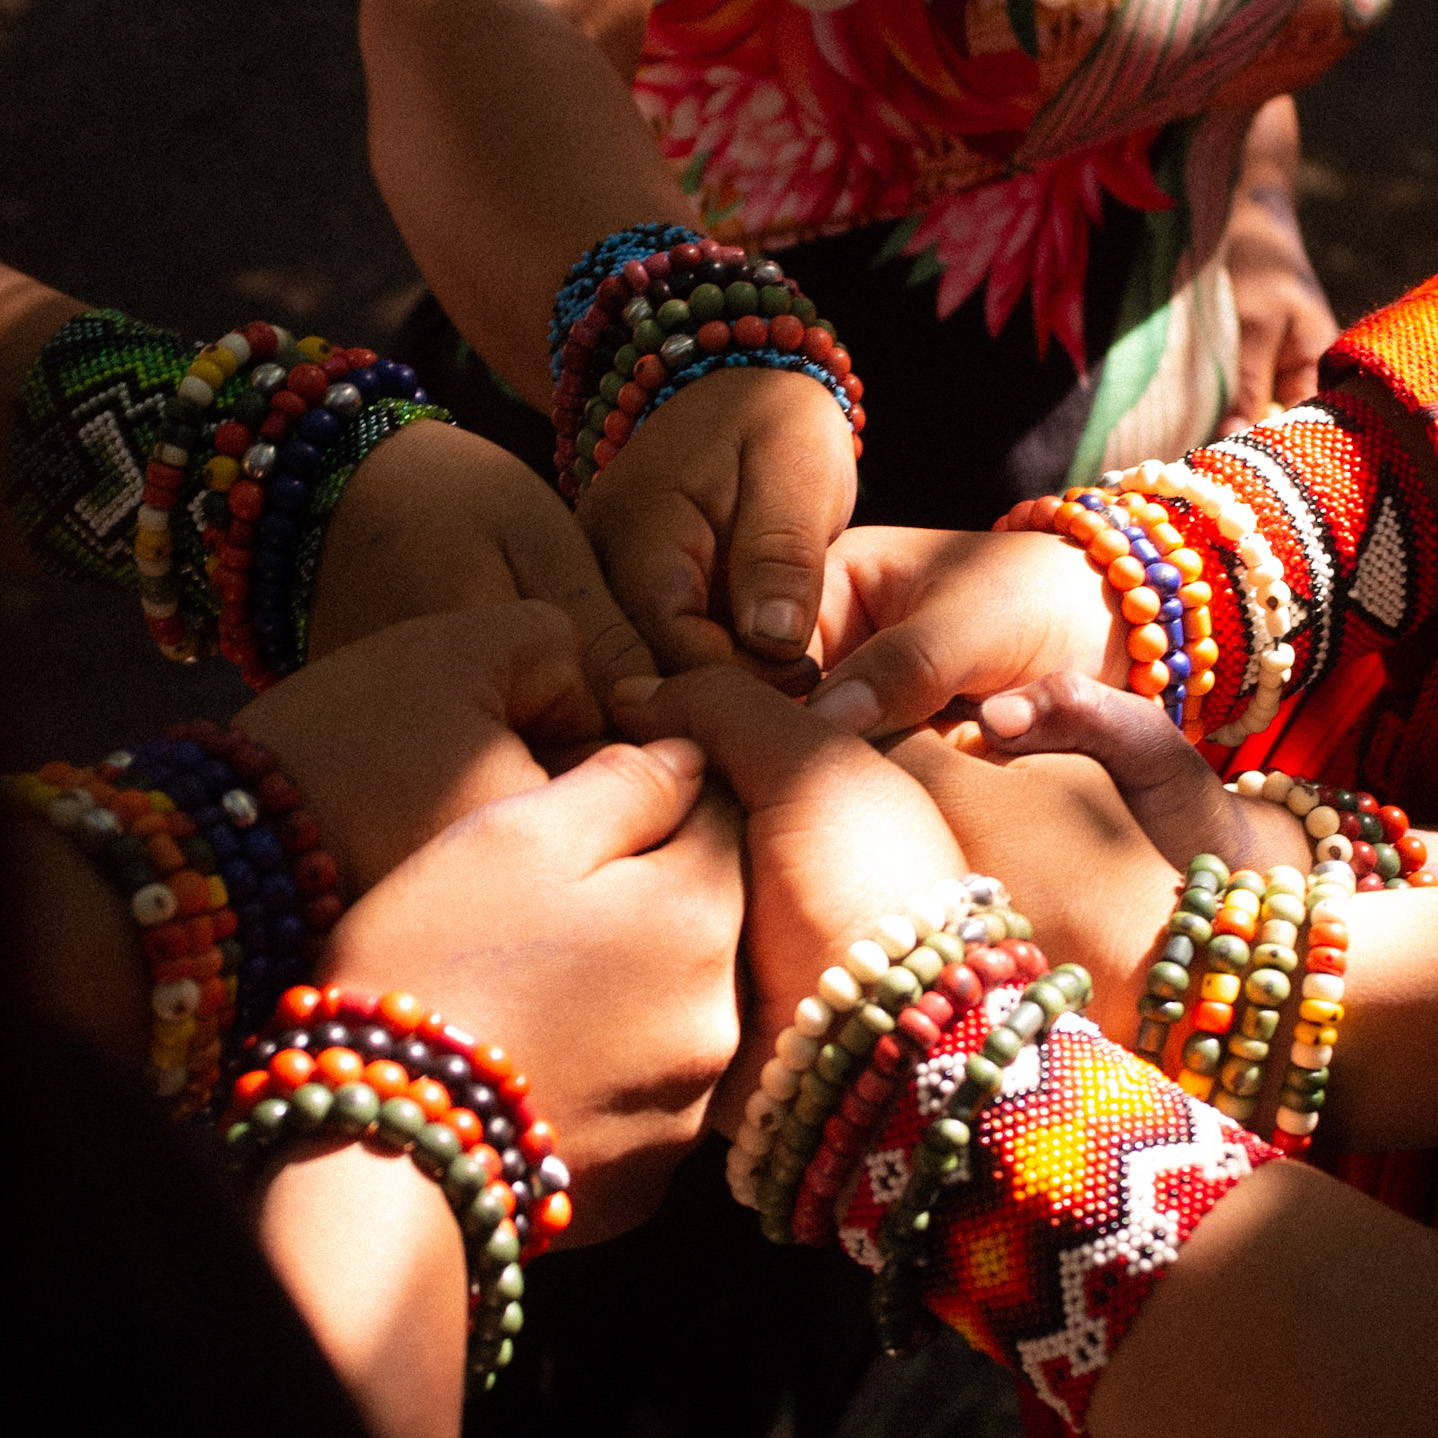 Circle of hands wearing Yawa Bands and traditional cuffs